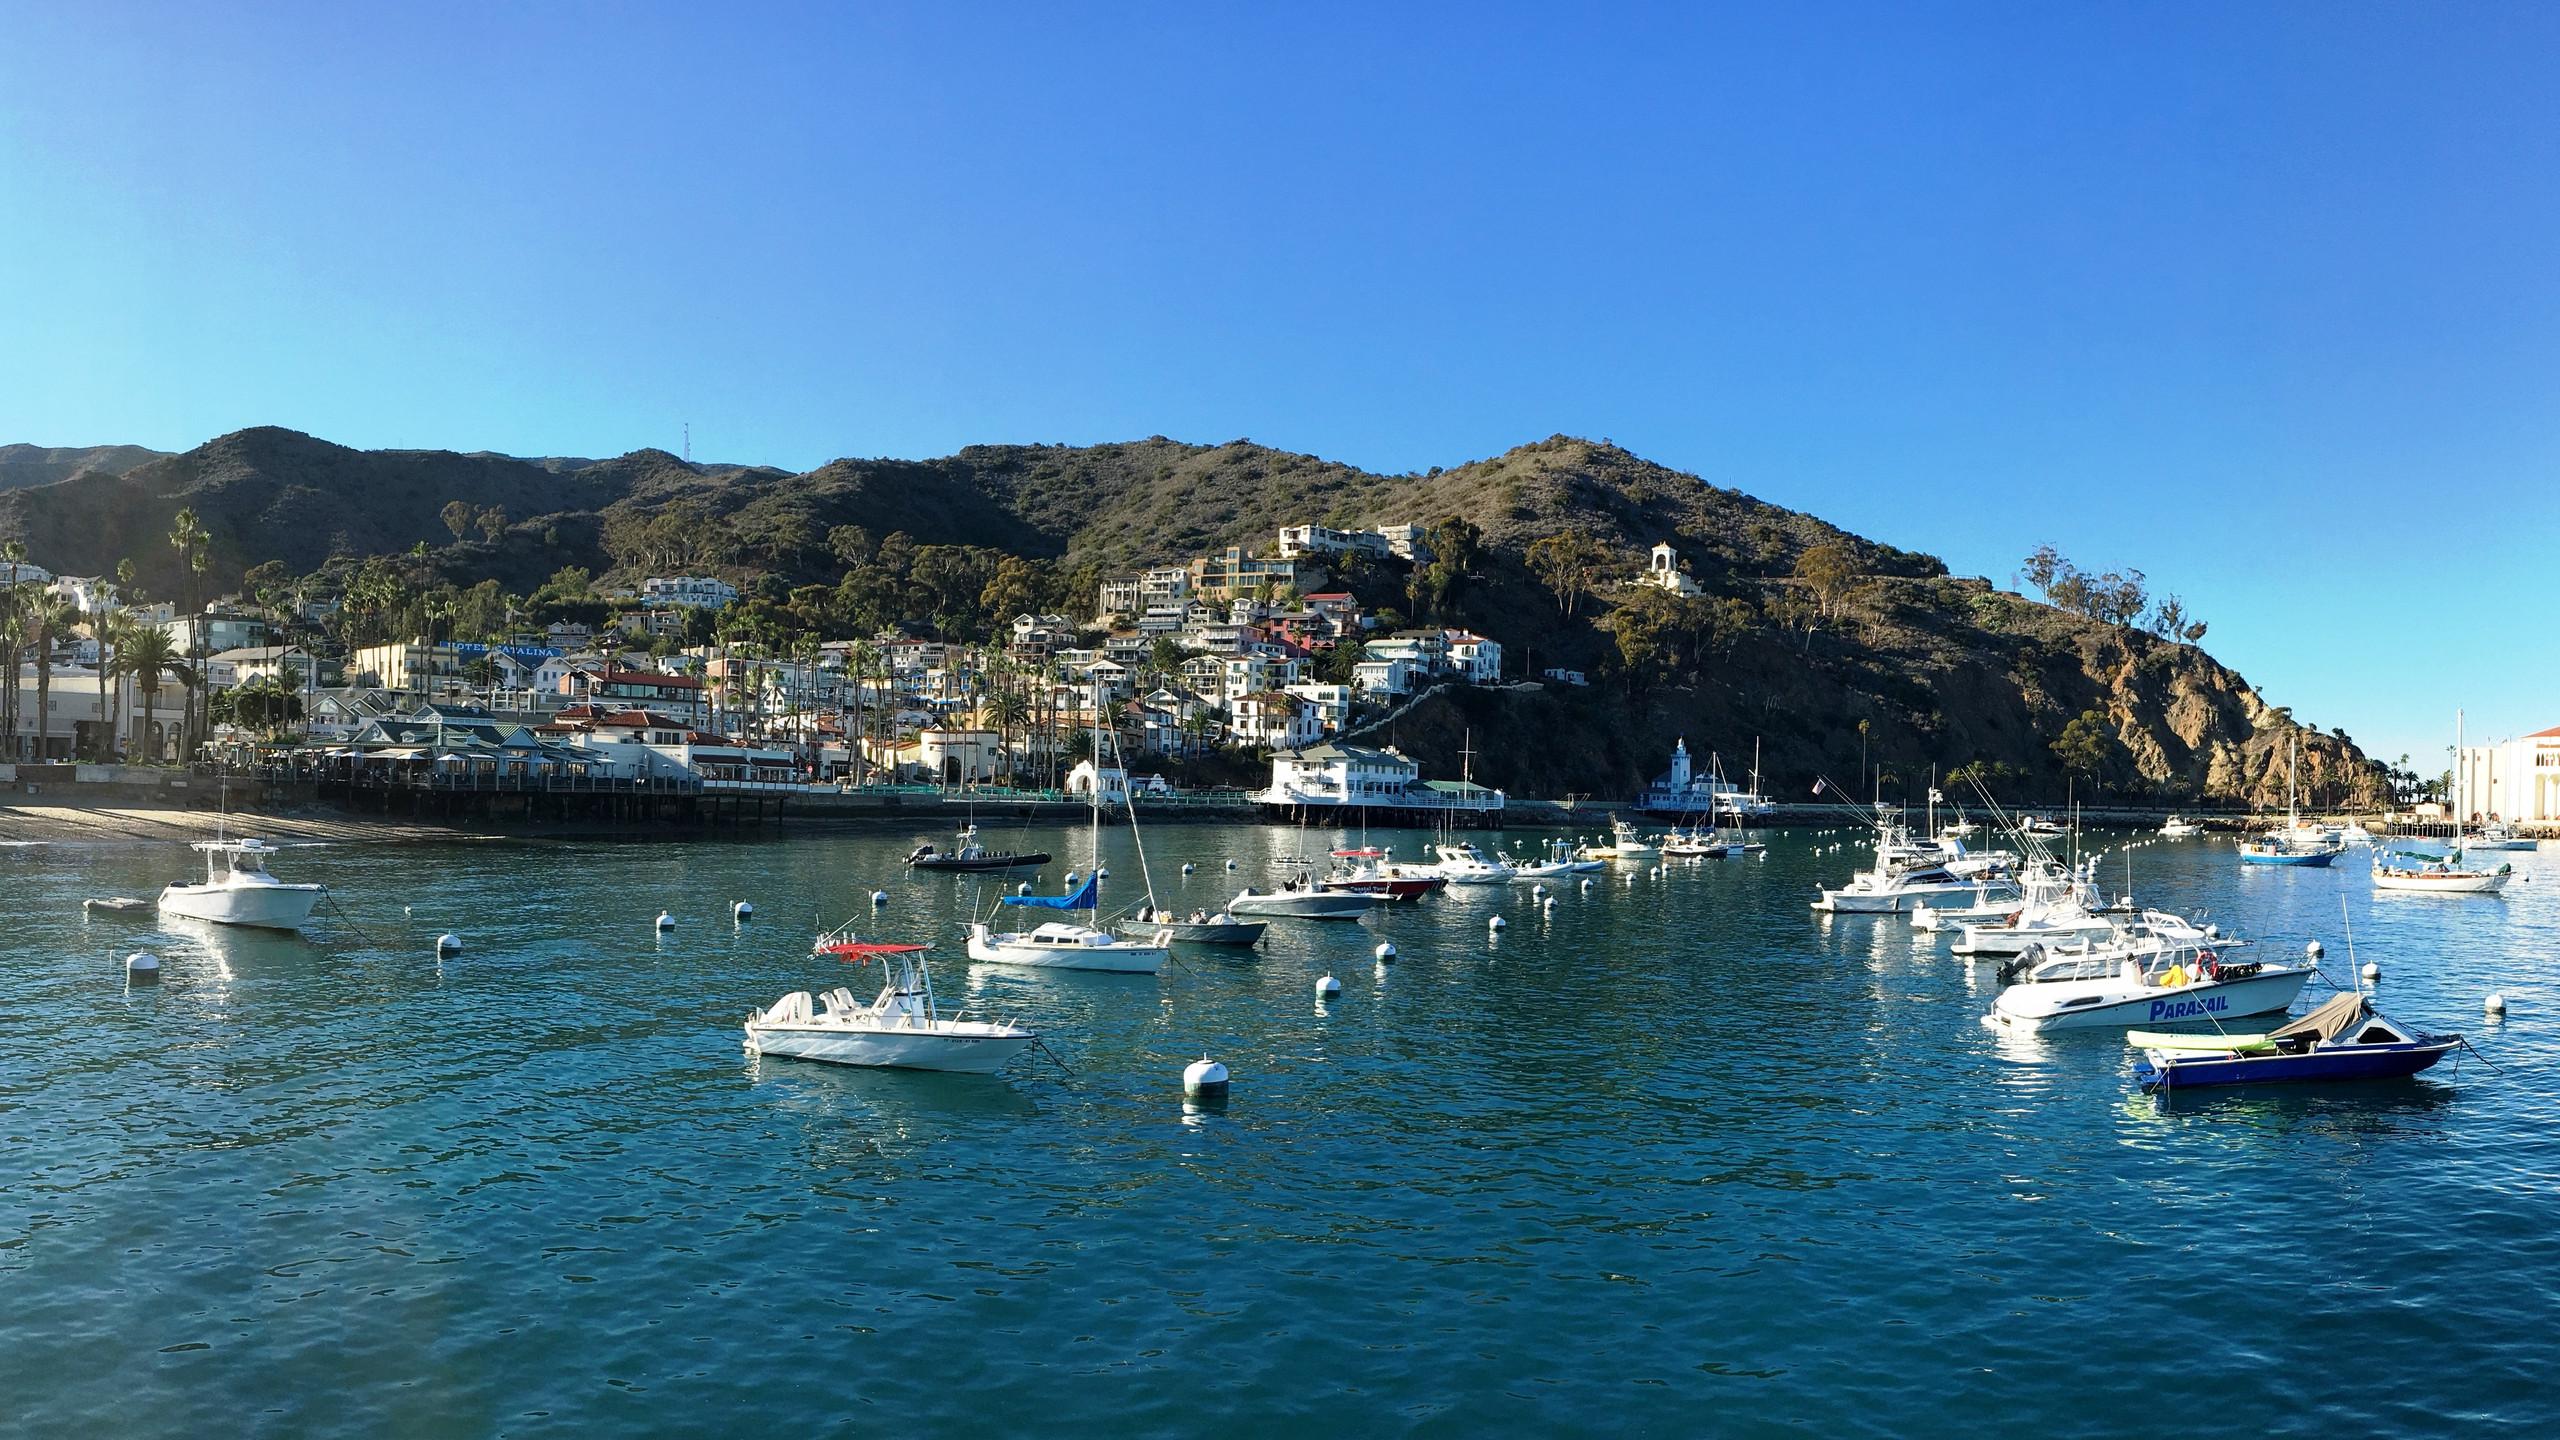 Avalon on Catalina Island